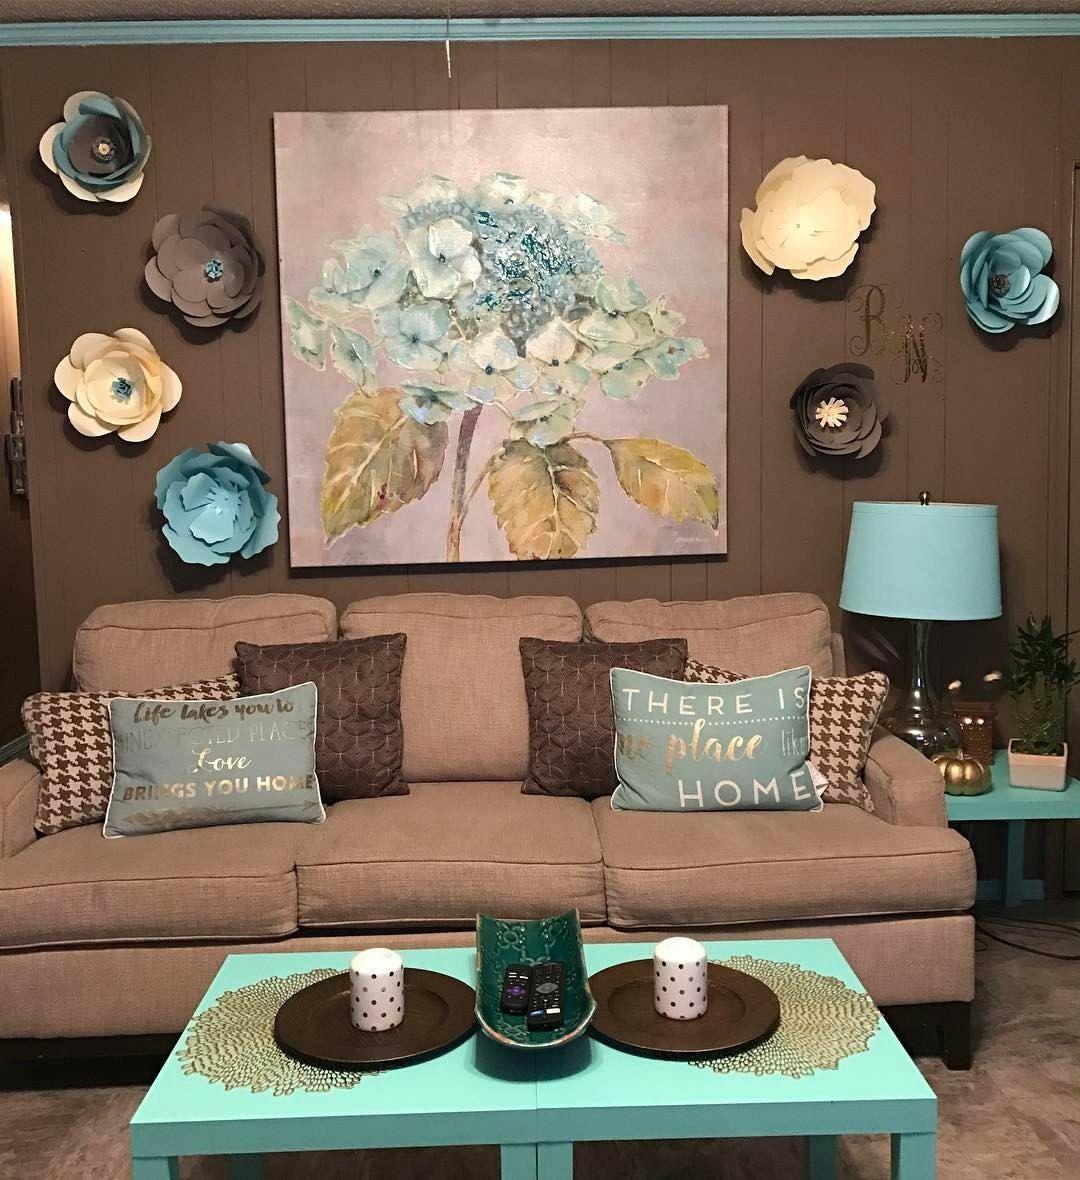 Time Being House Ideas Decor Home Living Room Decor Living